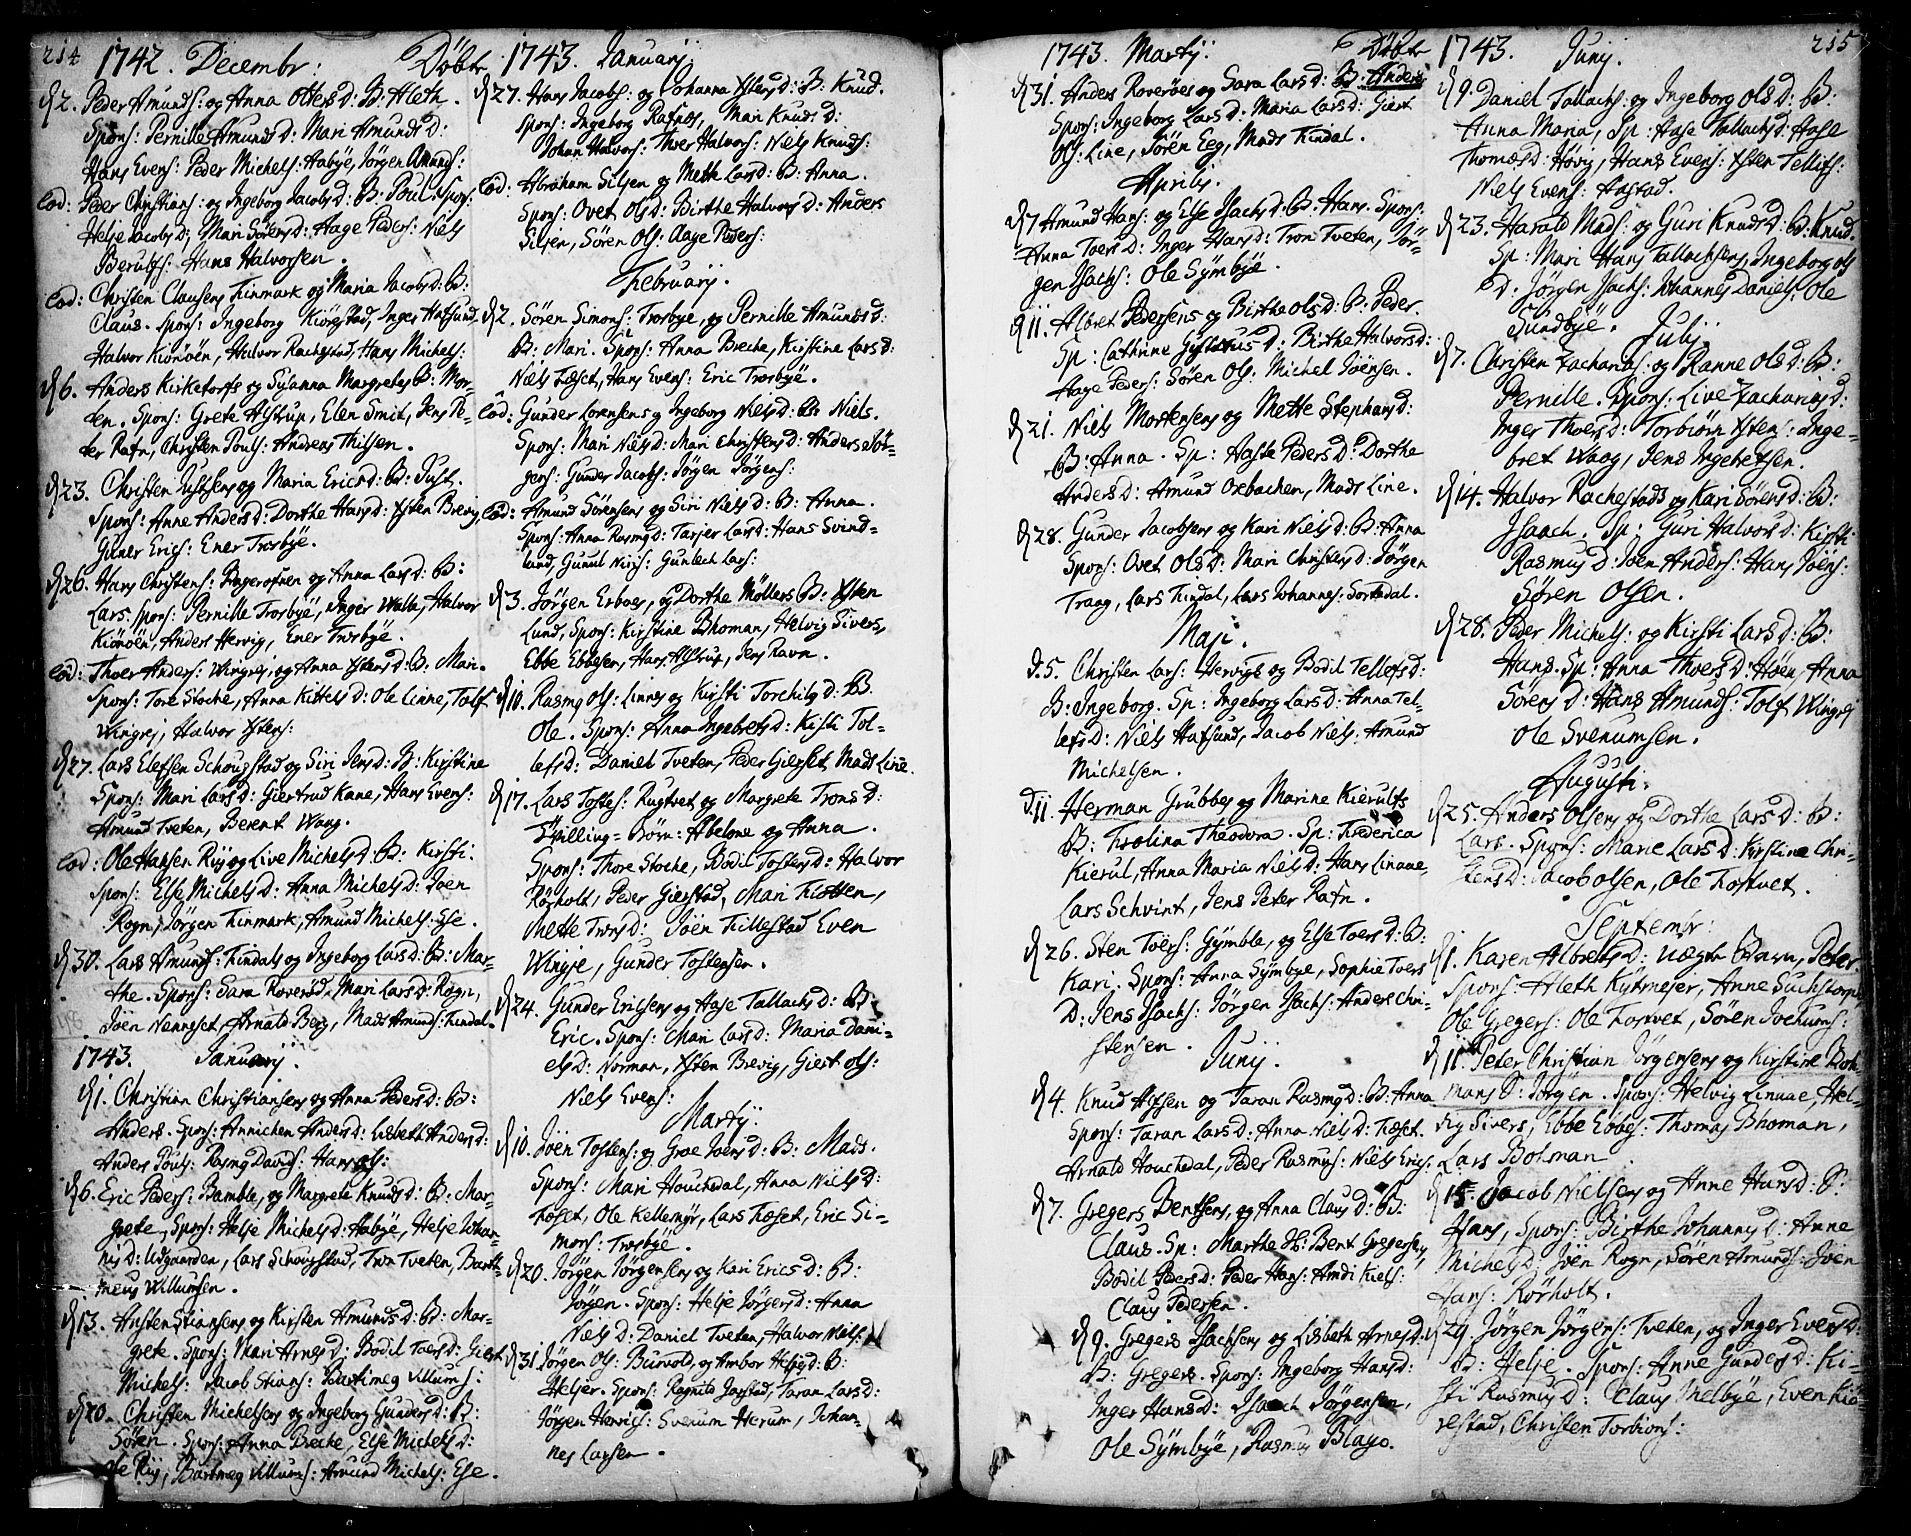 SAKO, Bamble kirkebøker, F/Fa/L0001: Ministerialbok nr. I 1, 1702-1774, s. 214-215